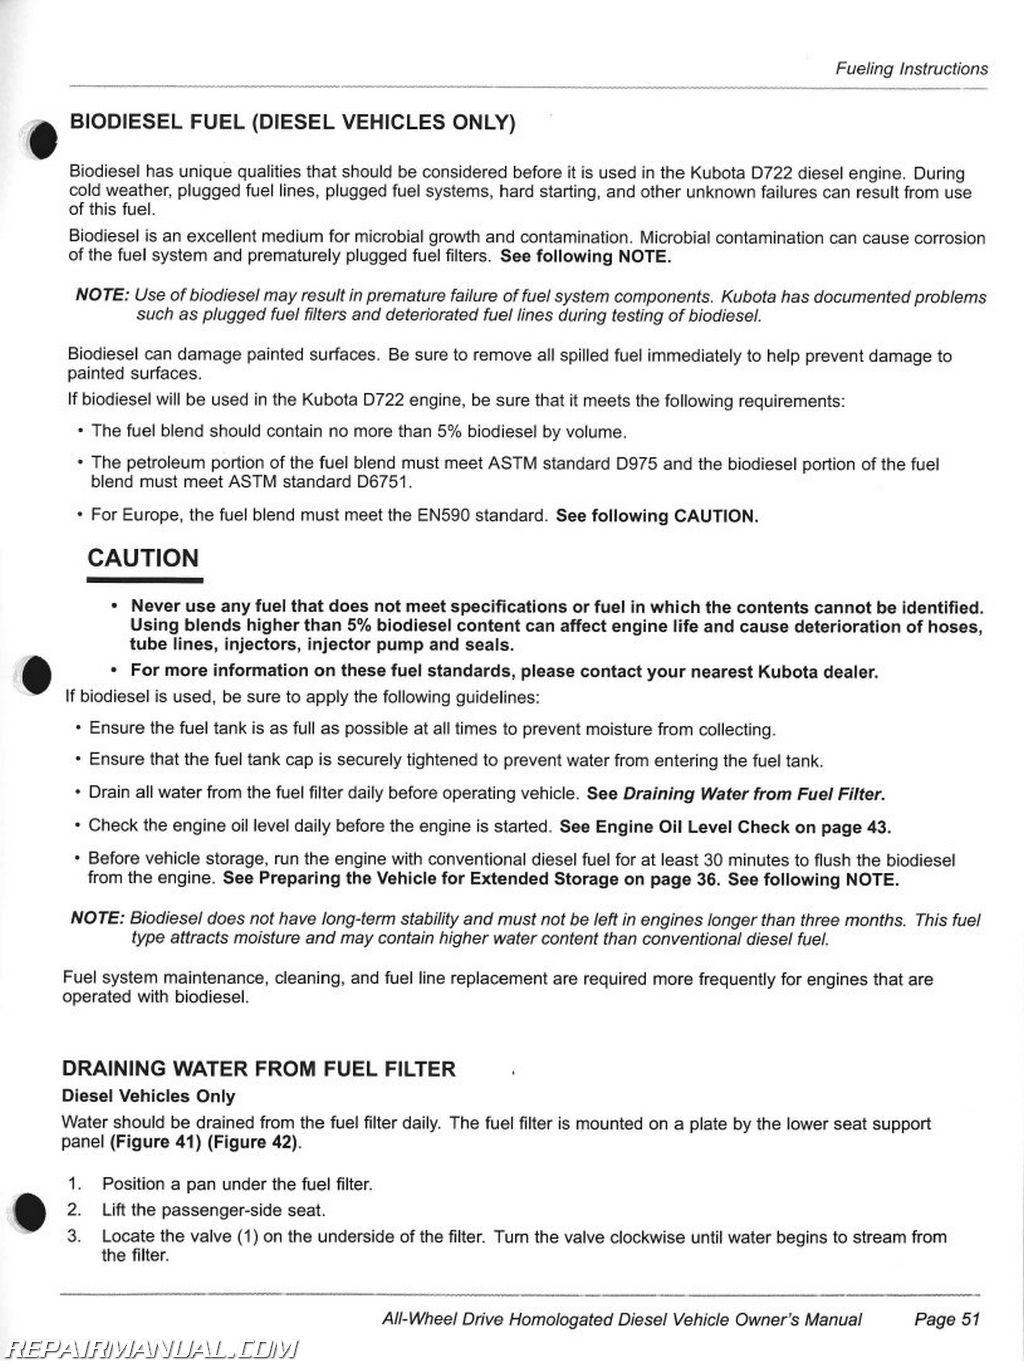 club car carryall 295 homologated diesel vehicle owners manual rh repairmanual com automobile owners manuals for sale automobile owners manuals free